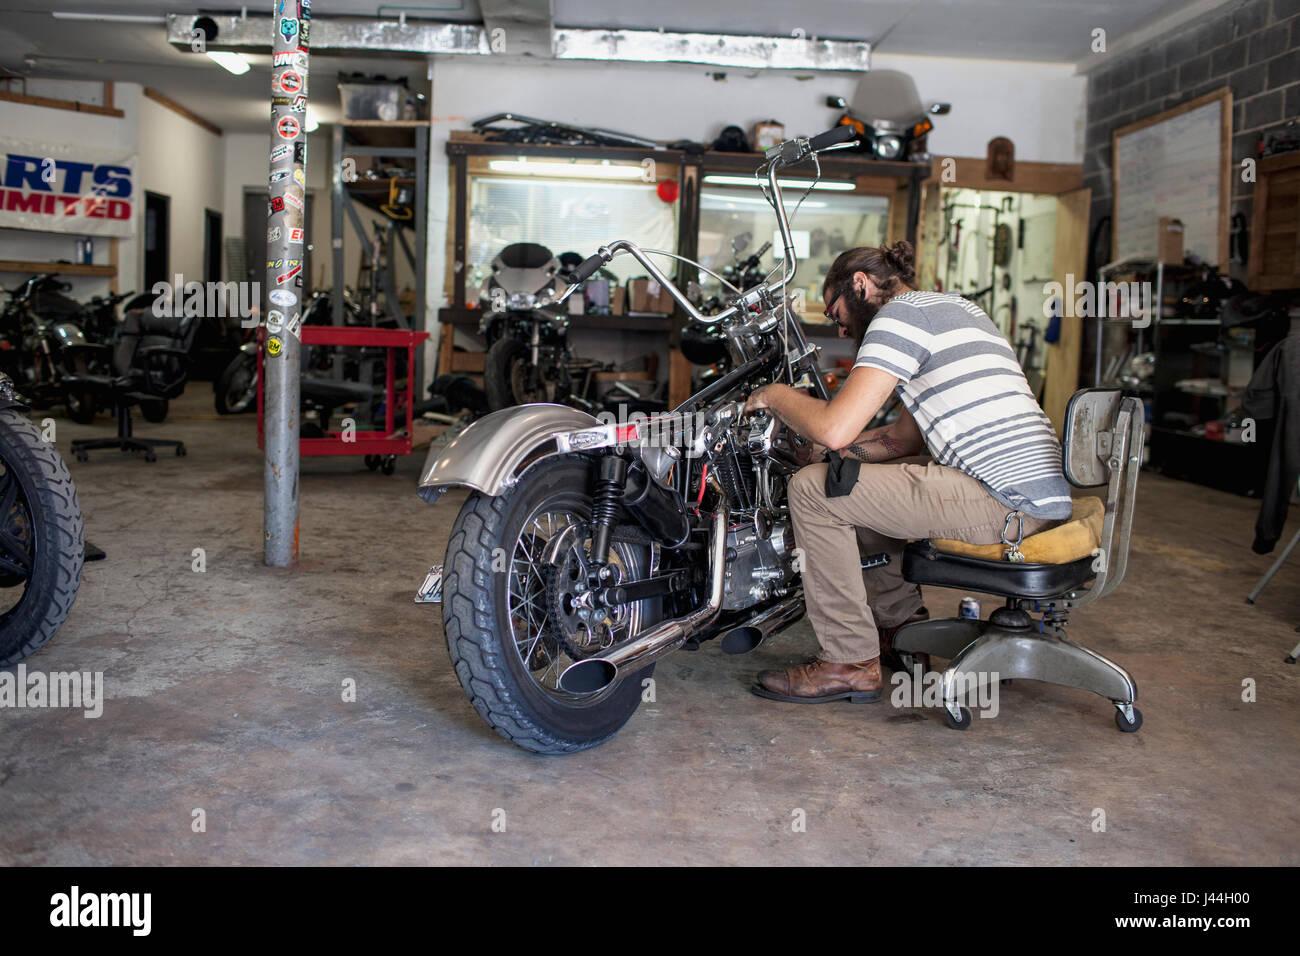 Joven reparar una moto Imagen De Stock